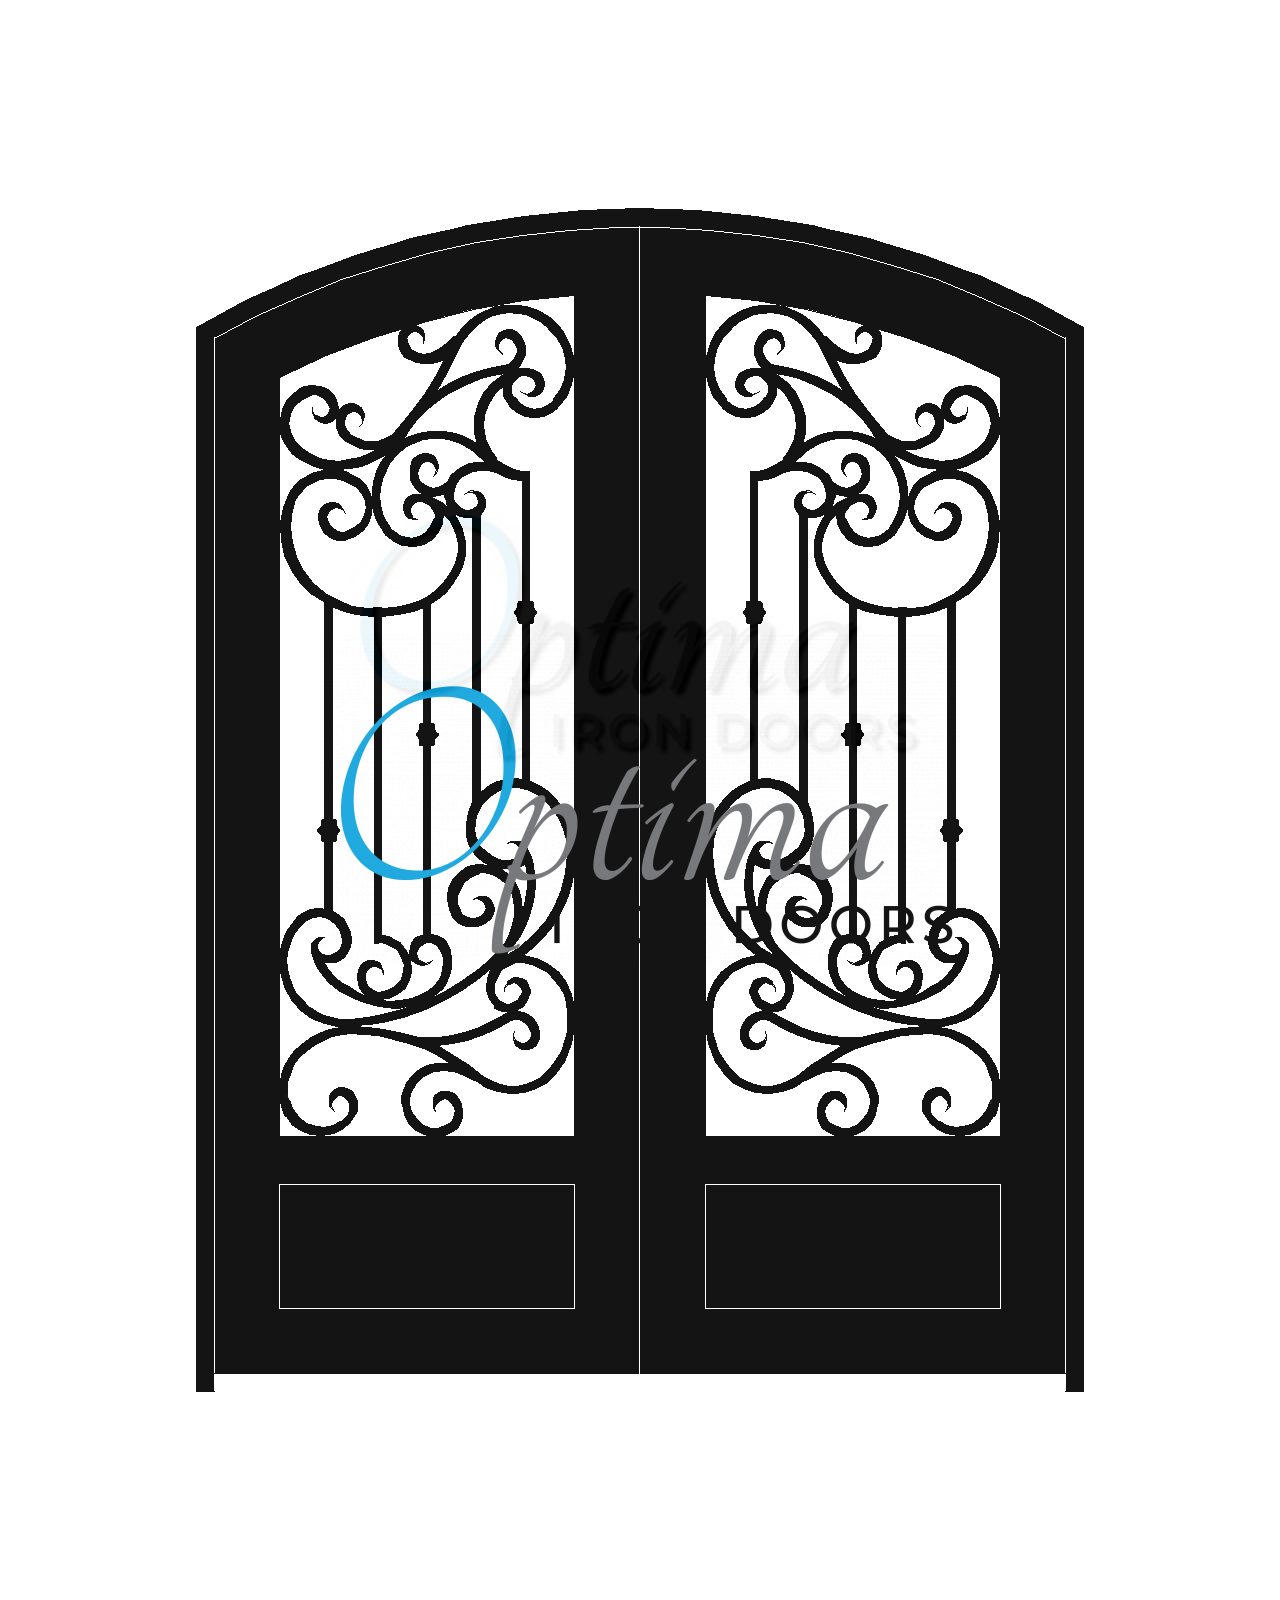 Standard Profile Arch Top 3/4's Lite Decorative Glass Double Iron Door - MURANO OID-6080-MUR1PAT